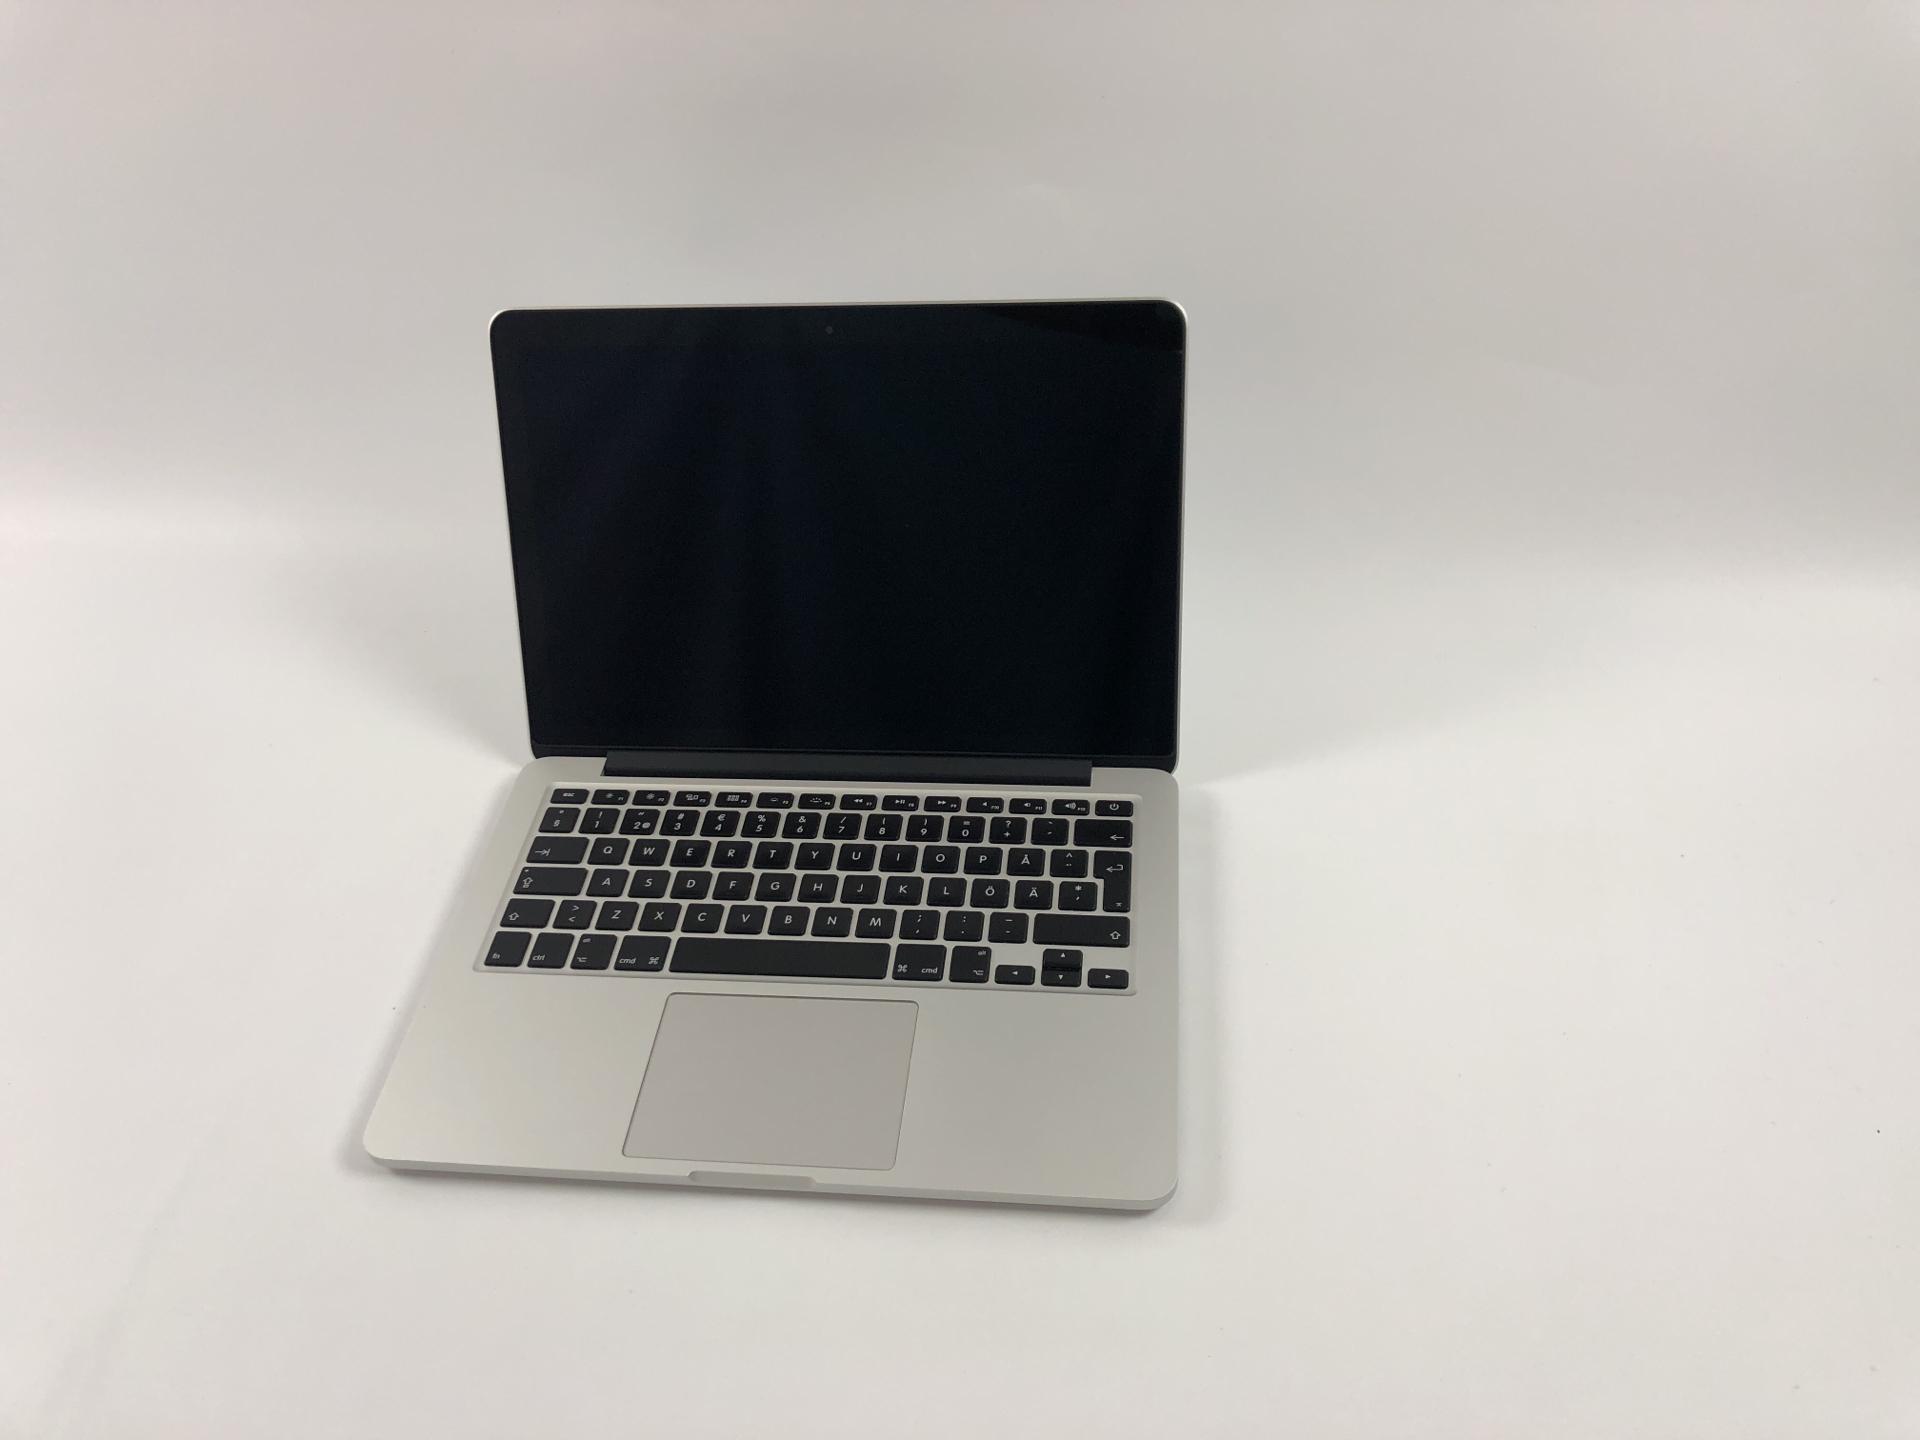 "MacBook Pro Retina 13"" Early 2015 (Intel Core i5 2.9 GHz 8 GB RAM 256 GB SSD), Intel Core i5 2.9 GHz, 8 GB RAM, 256 GB SSD, bild 1"